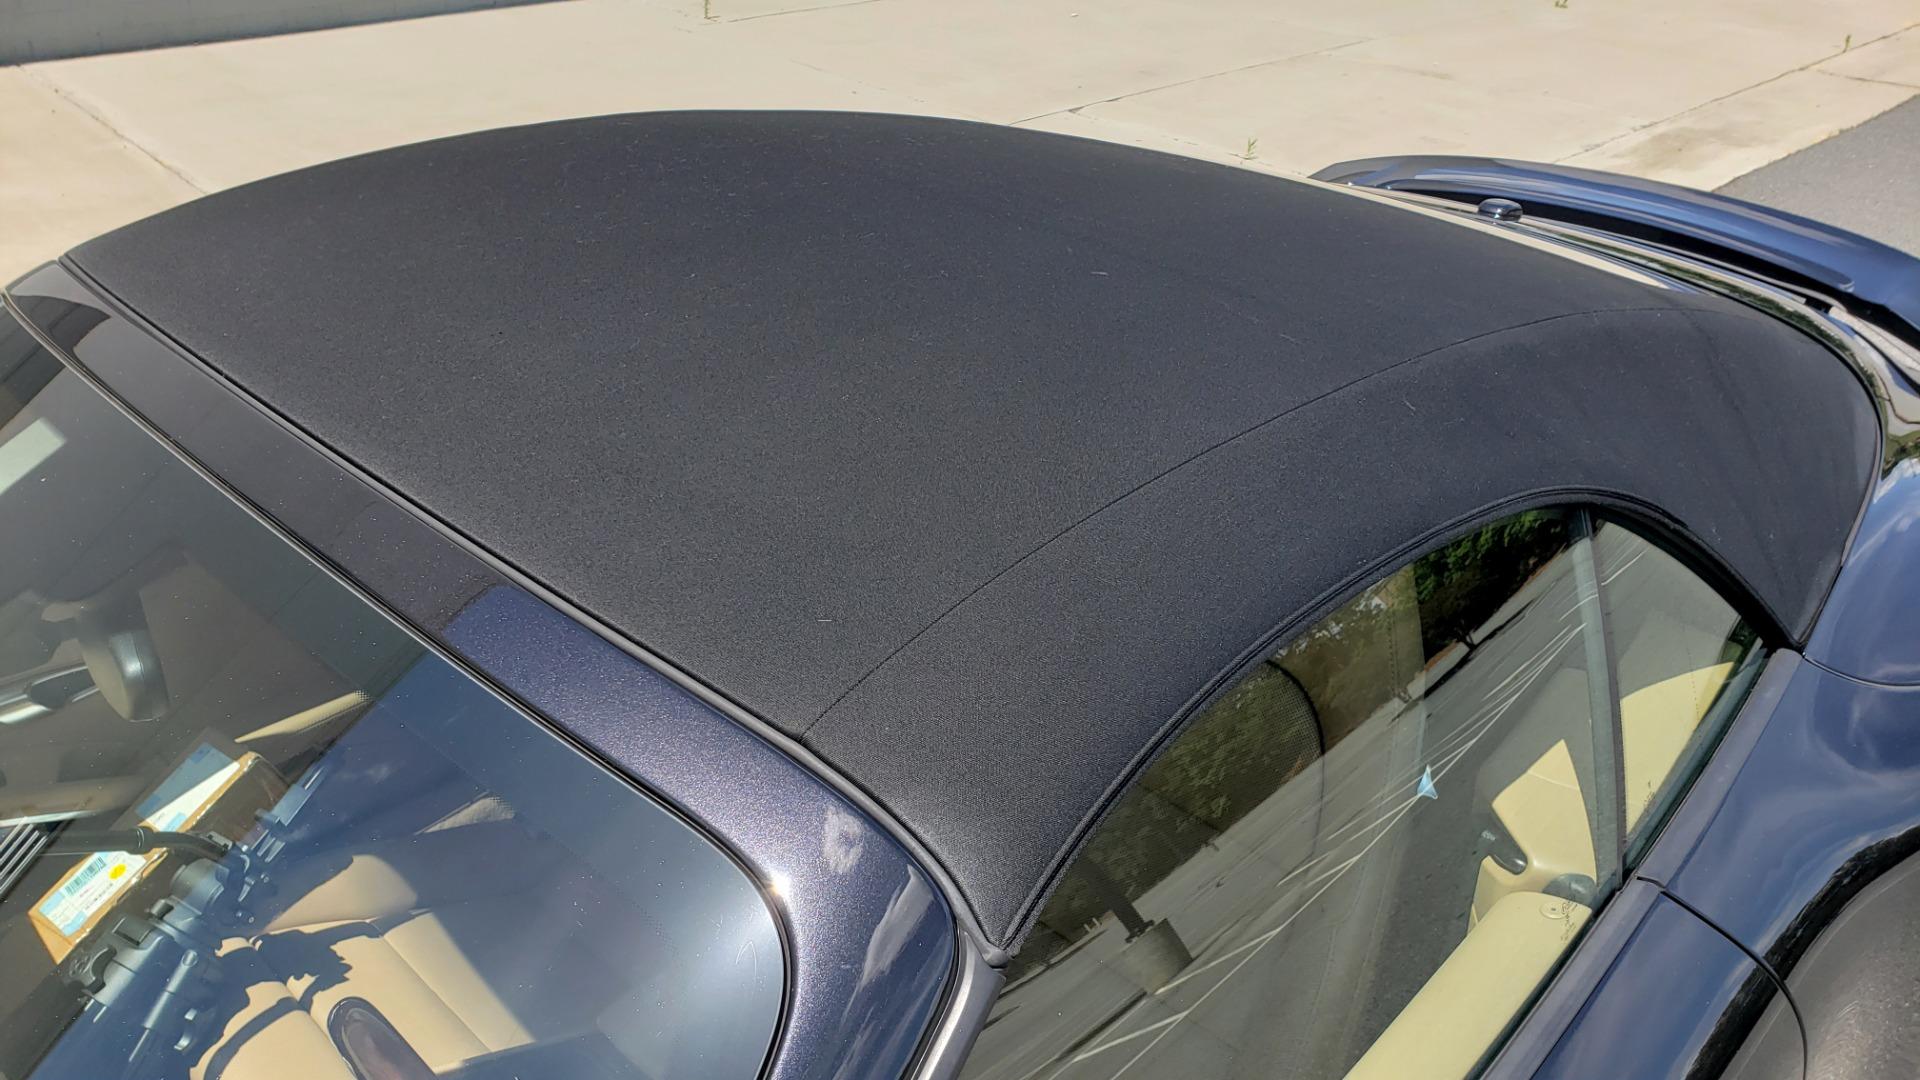 Used 2014 Porsche 911 CARRERA S CABRIOLET / PREM PKG / PDK / NAV / BOSE / SPORT CHRONO for sale $81,995 at Formula Imports in Charlotte NC 28227 15